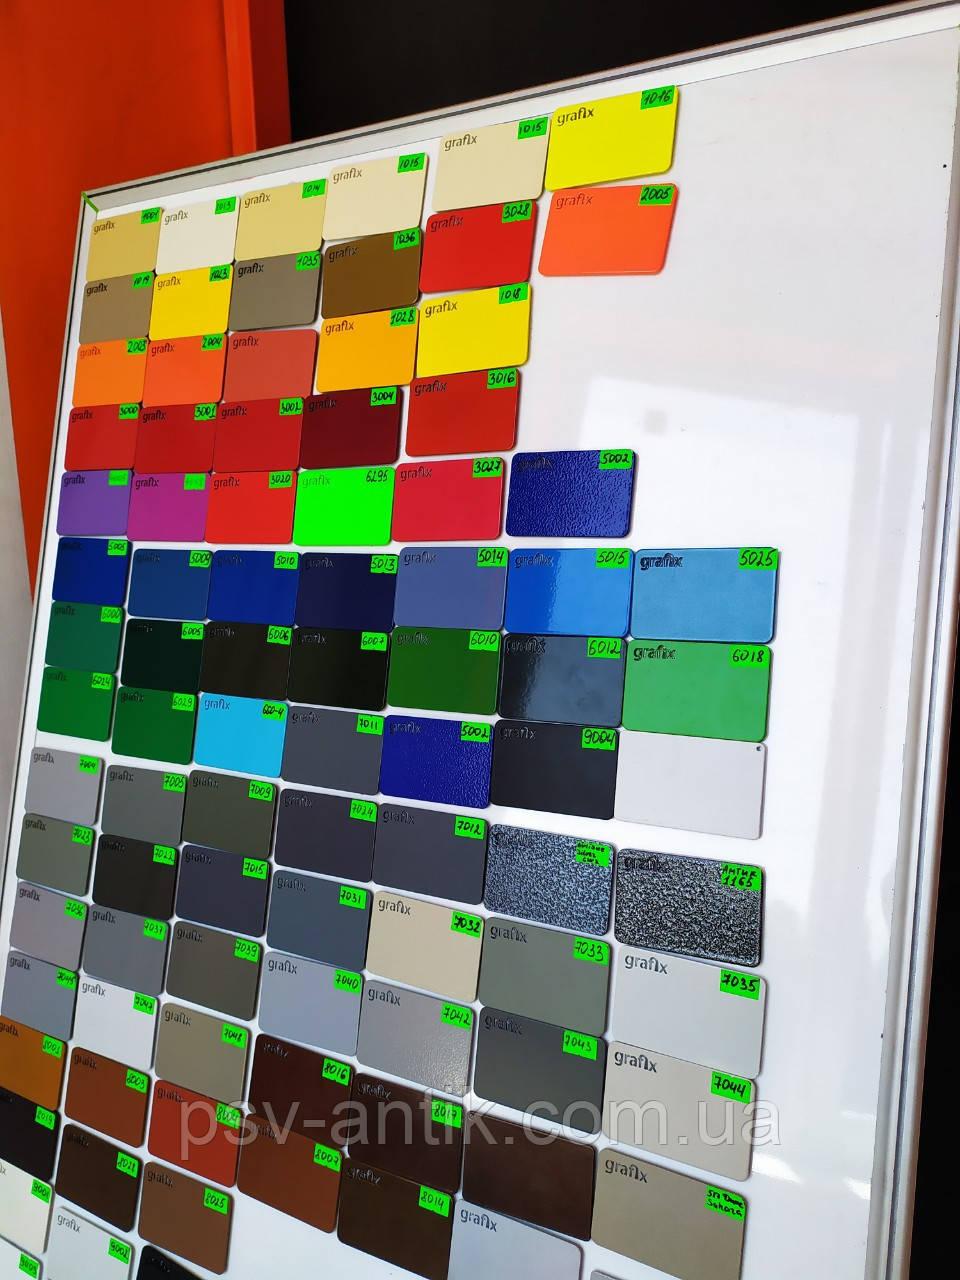 Порошковая краска глянцевая, полиэфирная, архитектурная, 5025